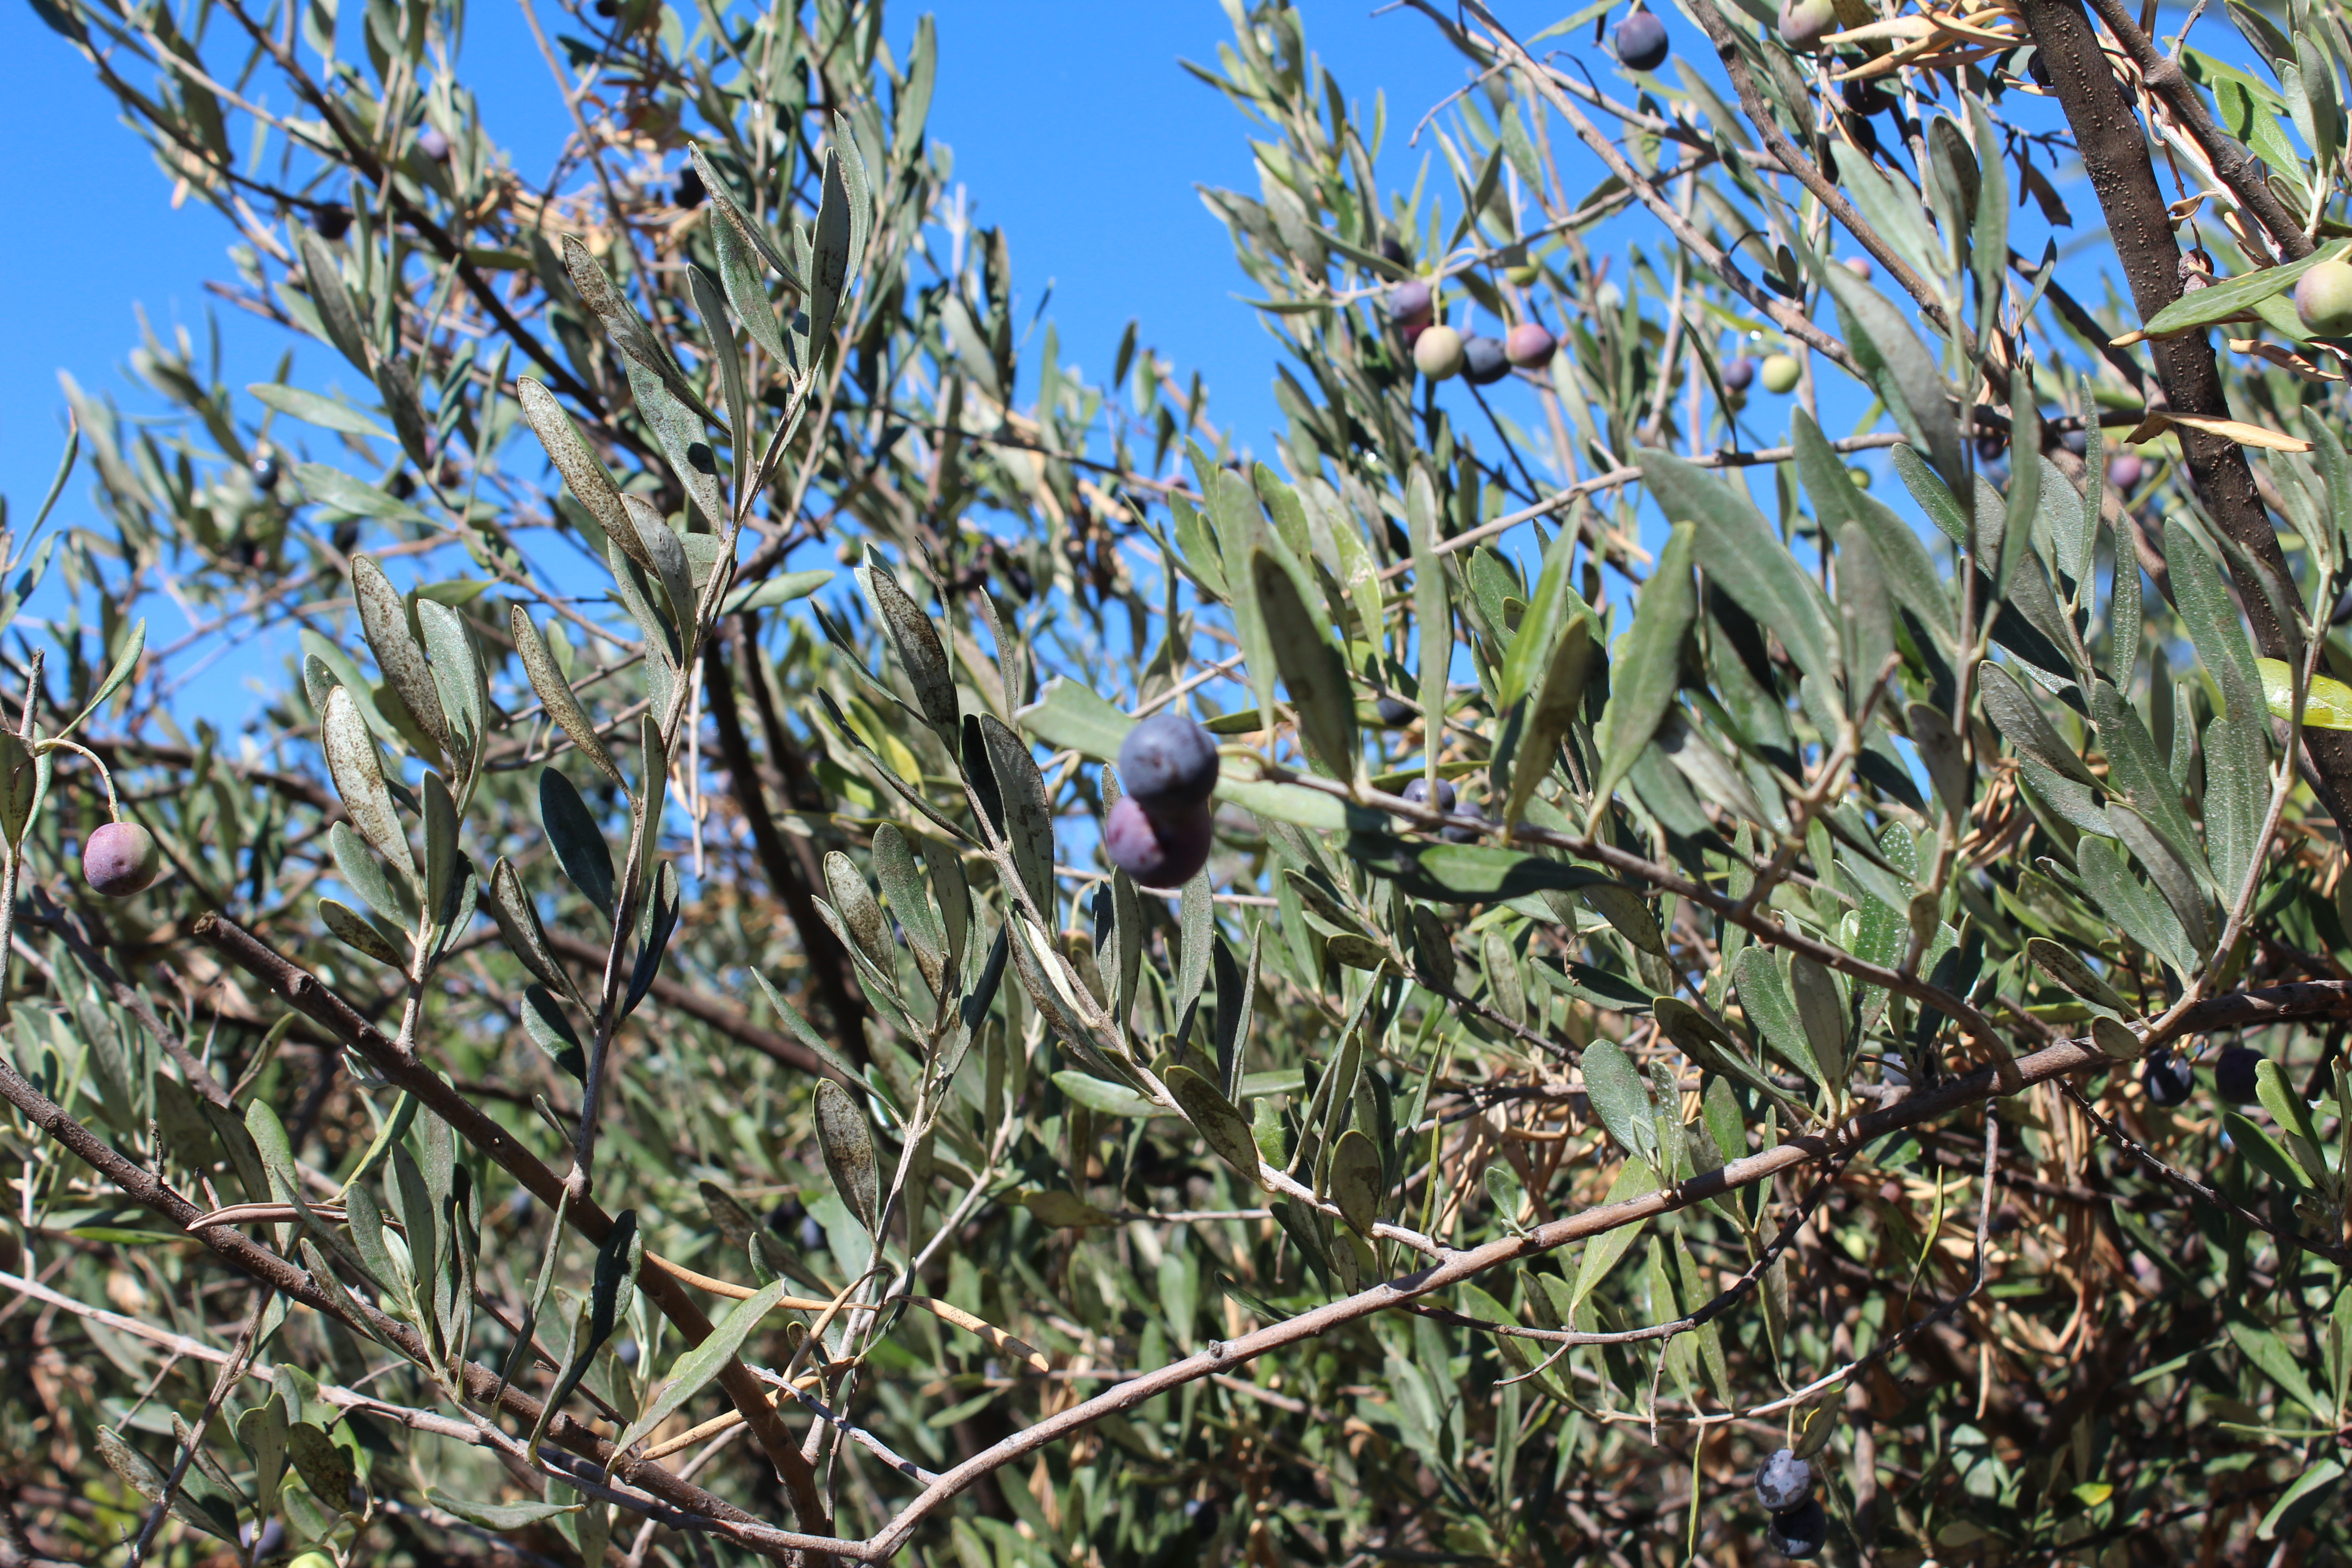 Infused Olive Oils Merritt Island, FL